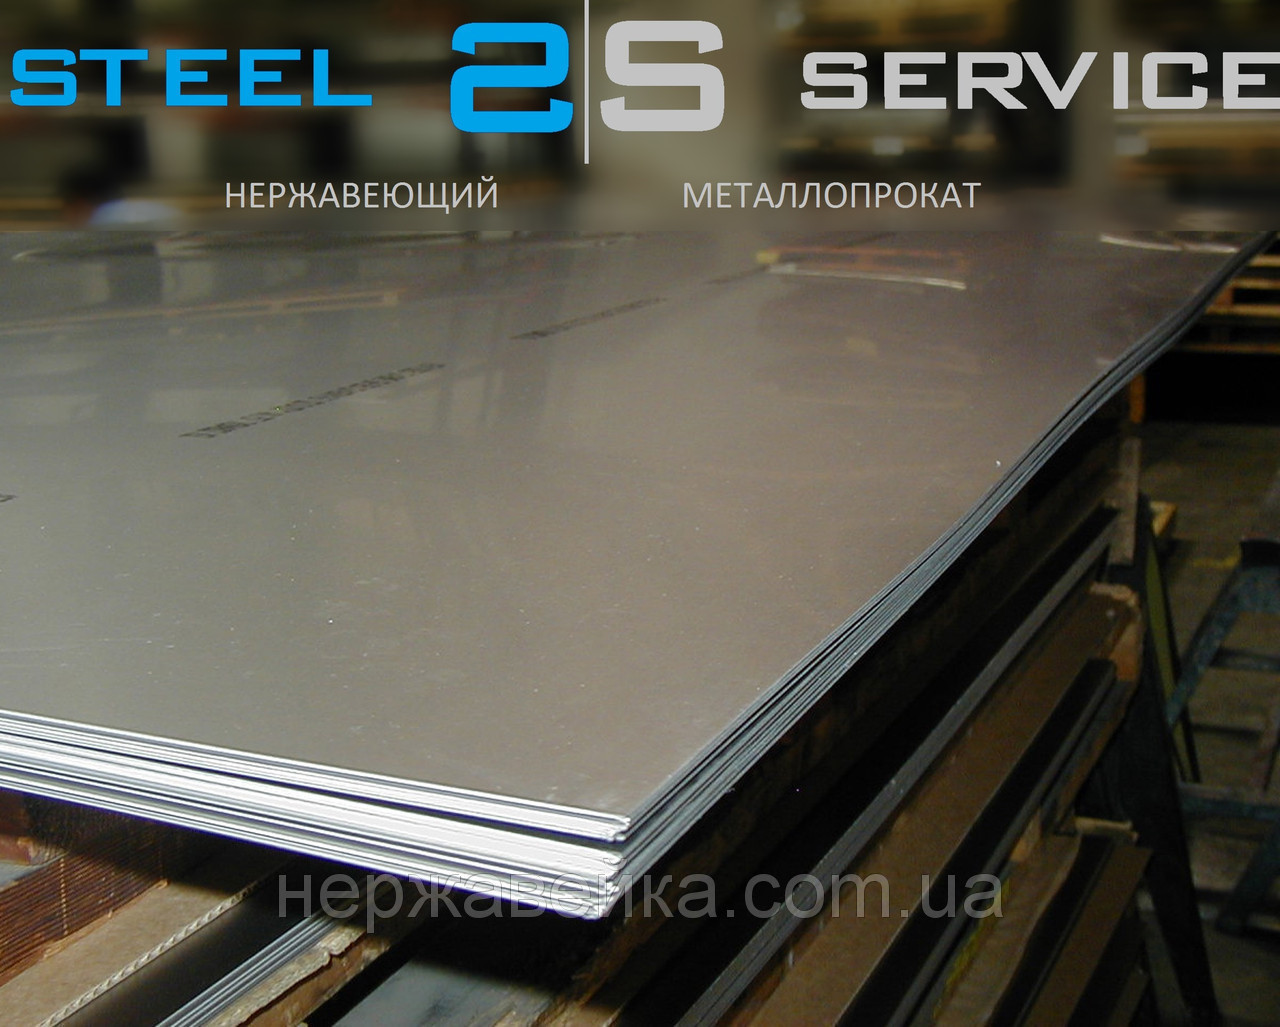 Нержавейка лист 5х1000х2000мм  AISI 316Ti(10Х17Н13М2Т) F1 - горячекатанный,  кислотостойкий